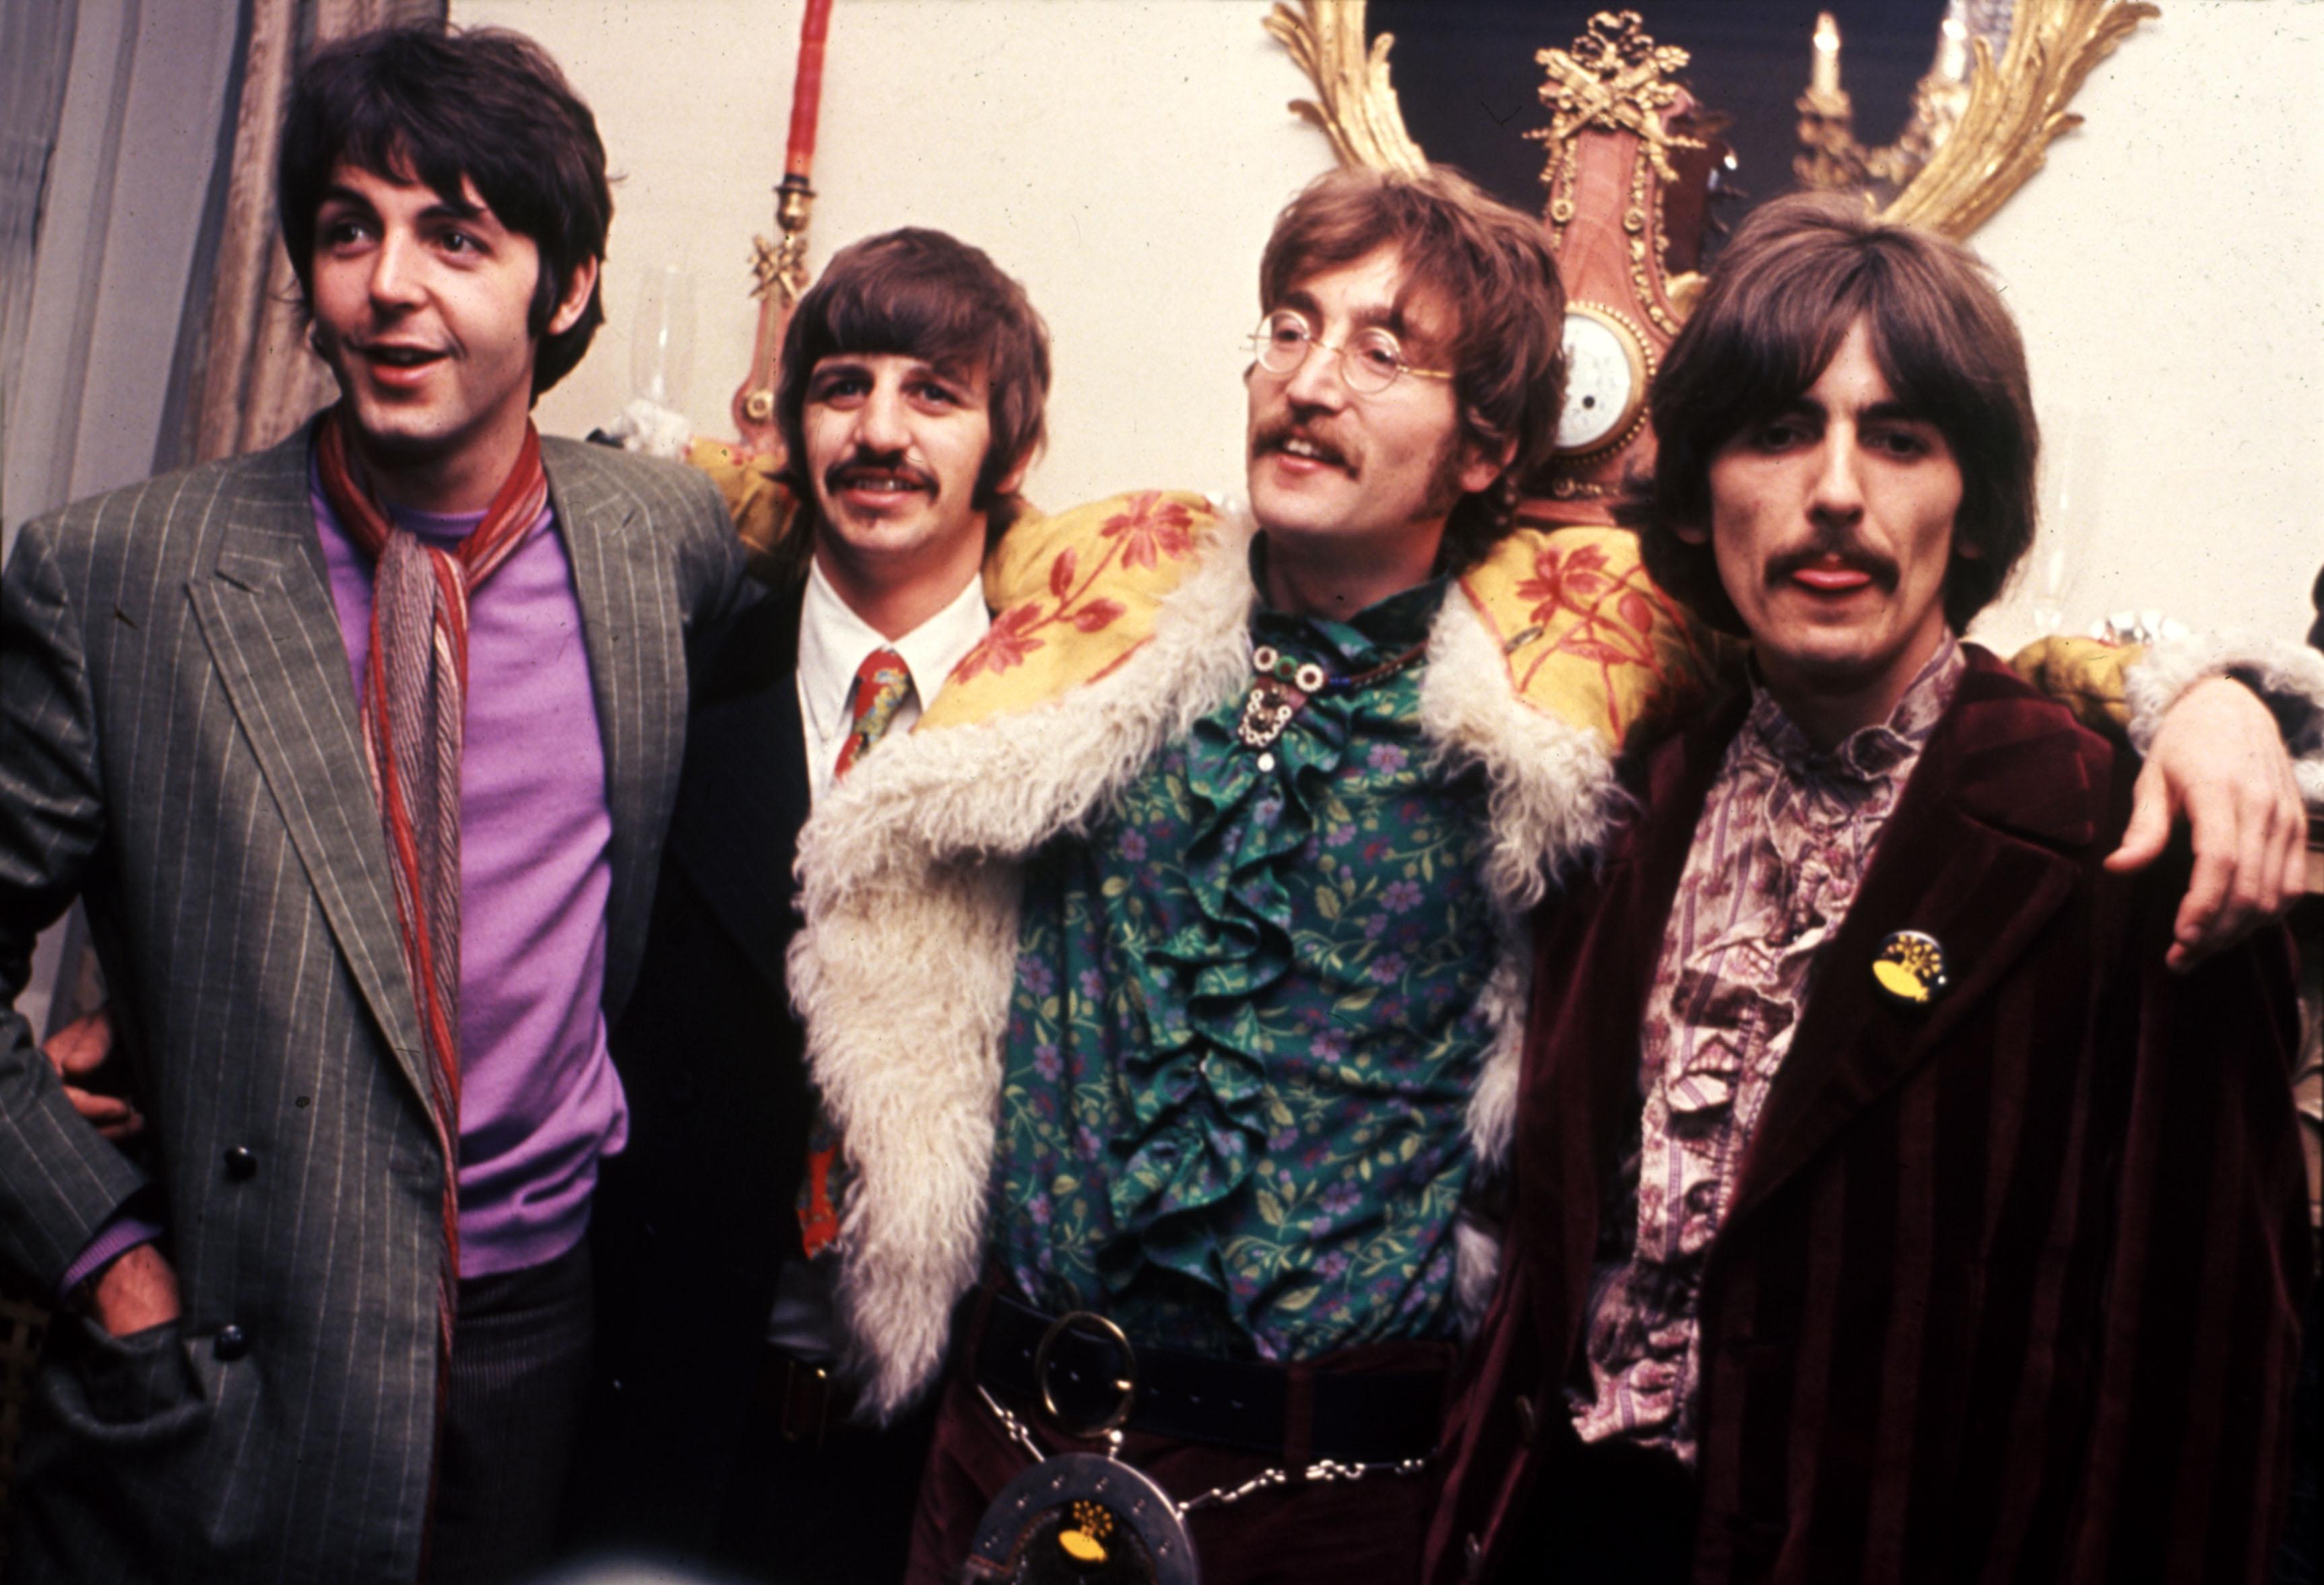 Stereophonics, Mick Hucknall among artists on Beatles album reboot